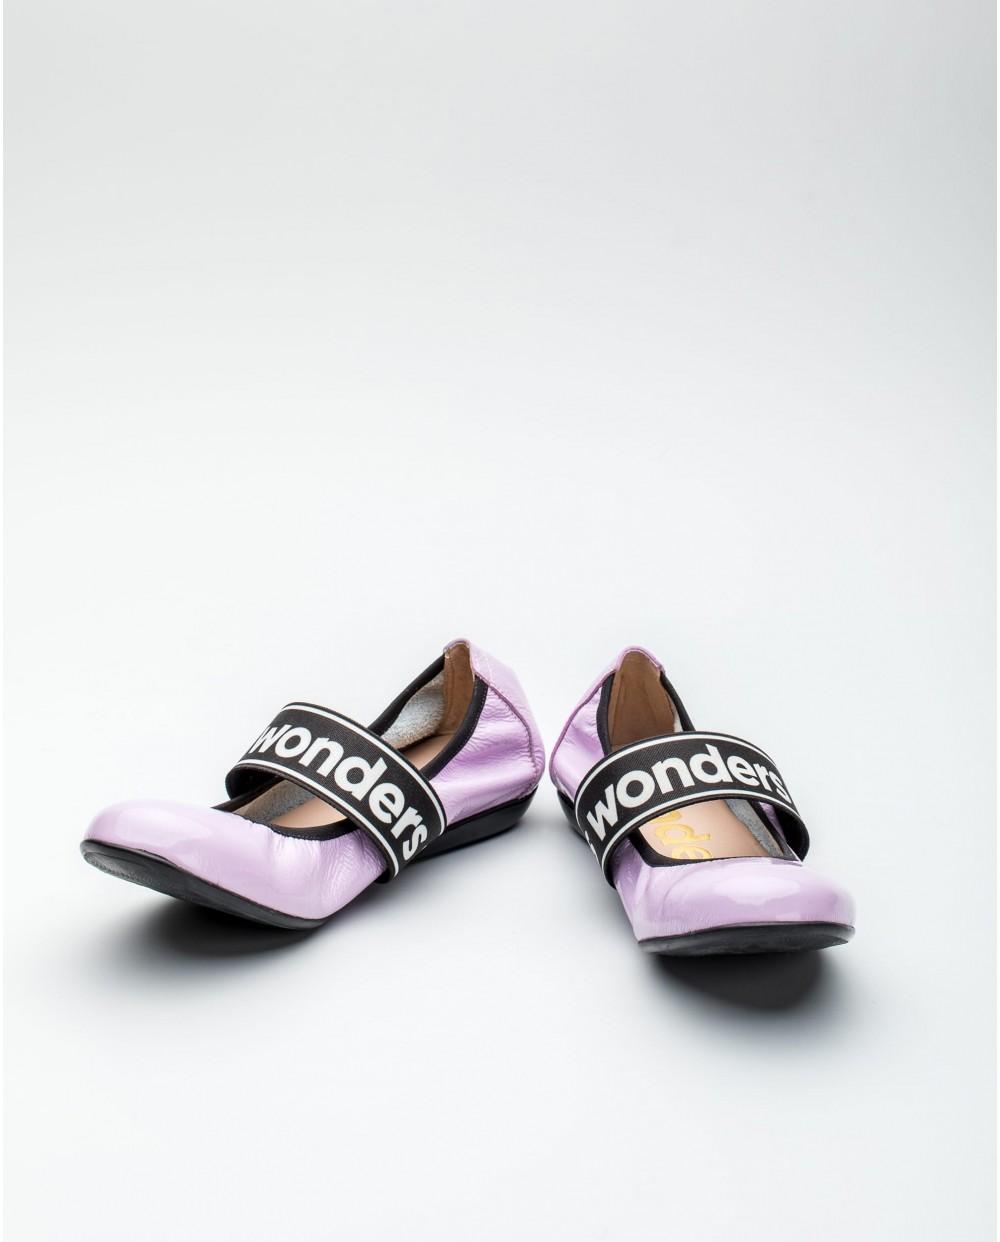 Wonders-Flat Shoes-Jewel detail sandal